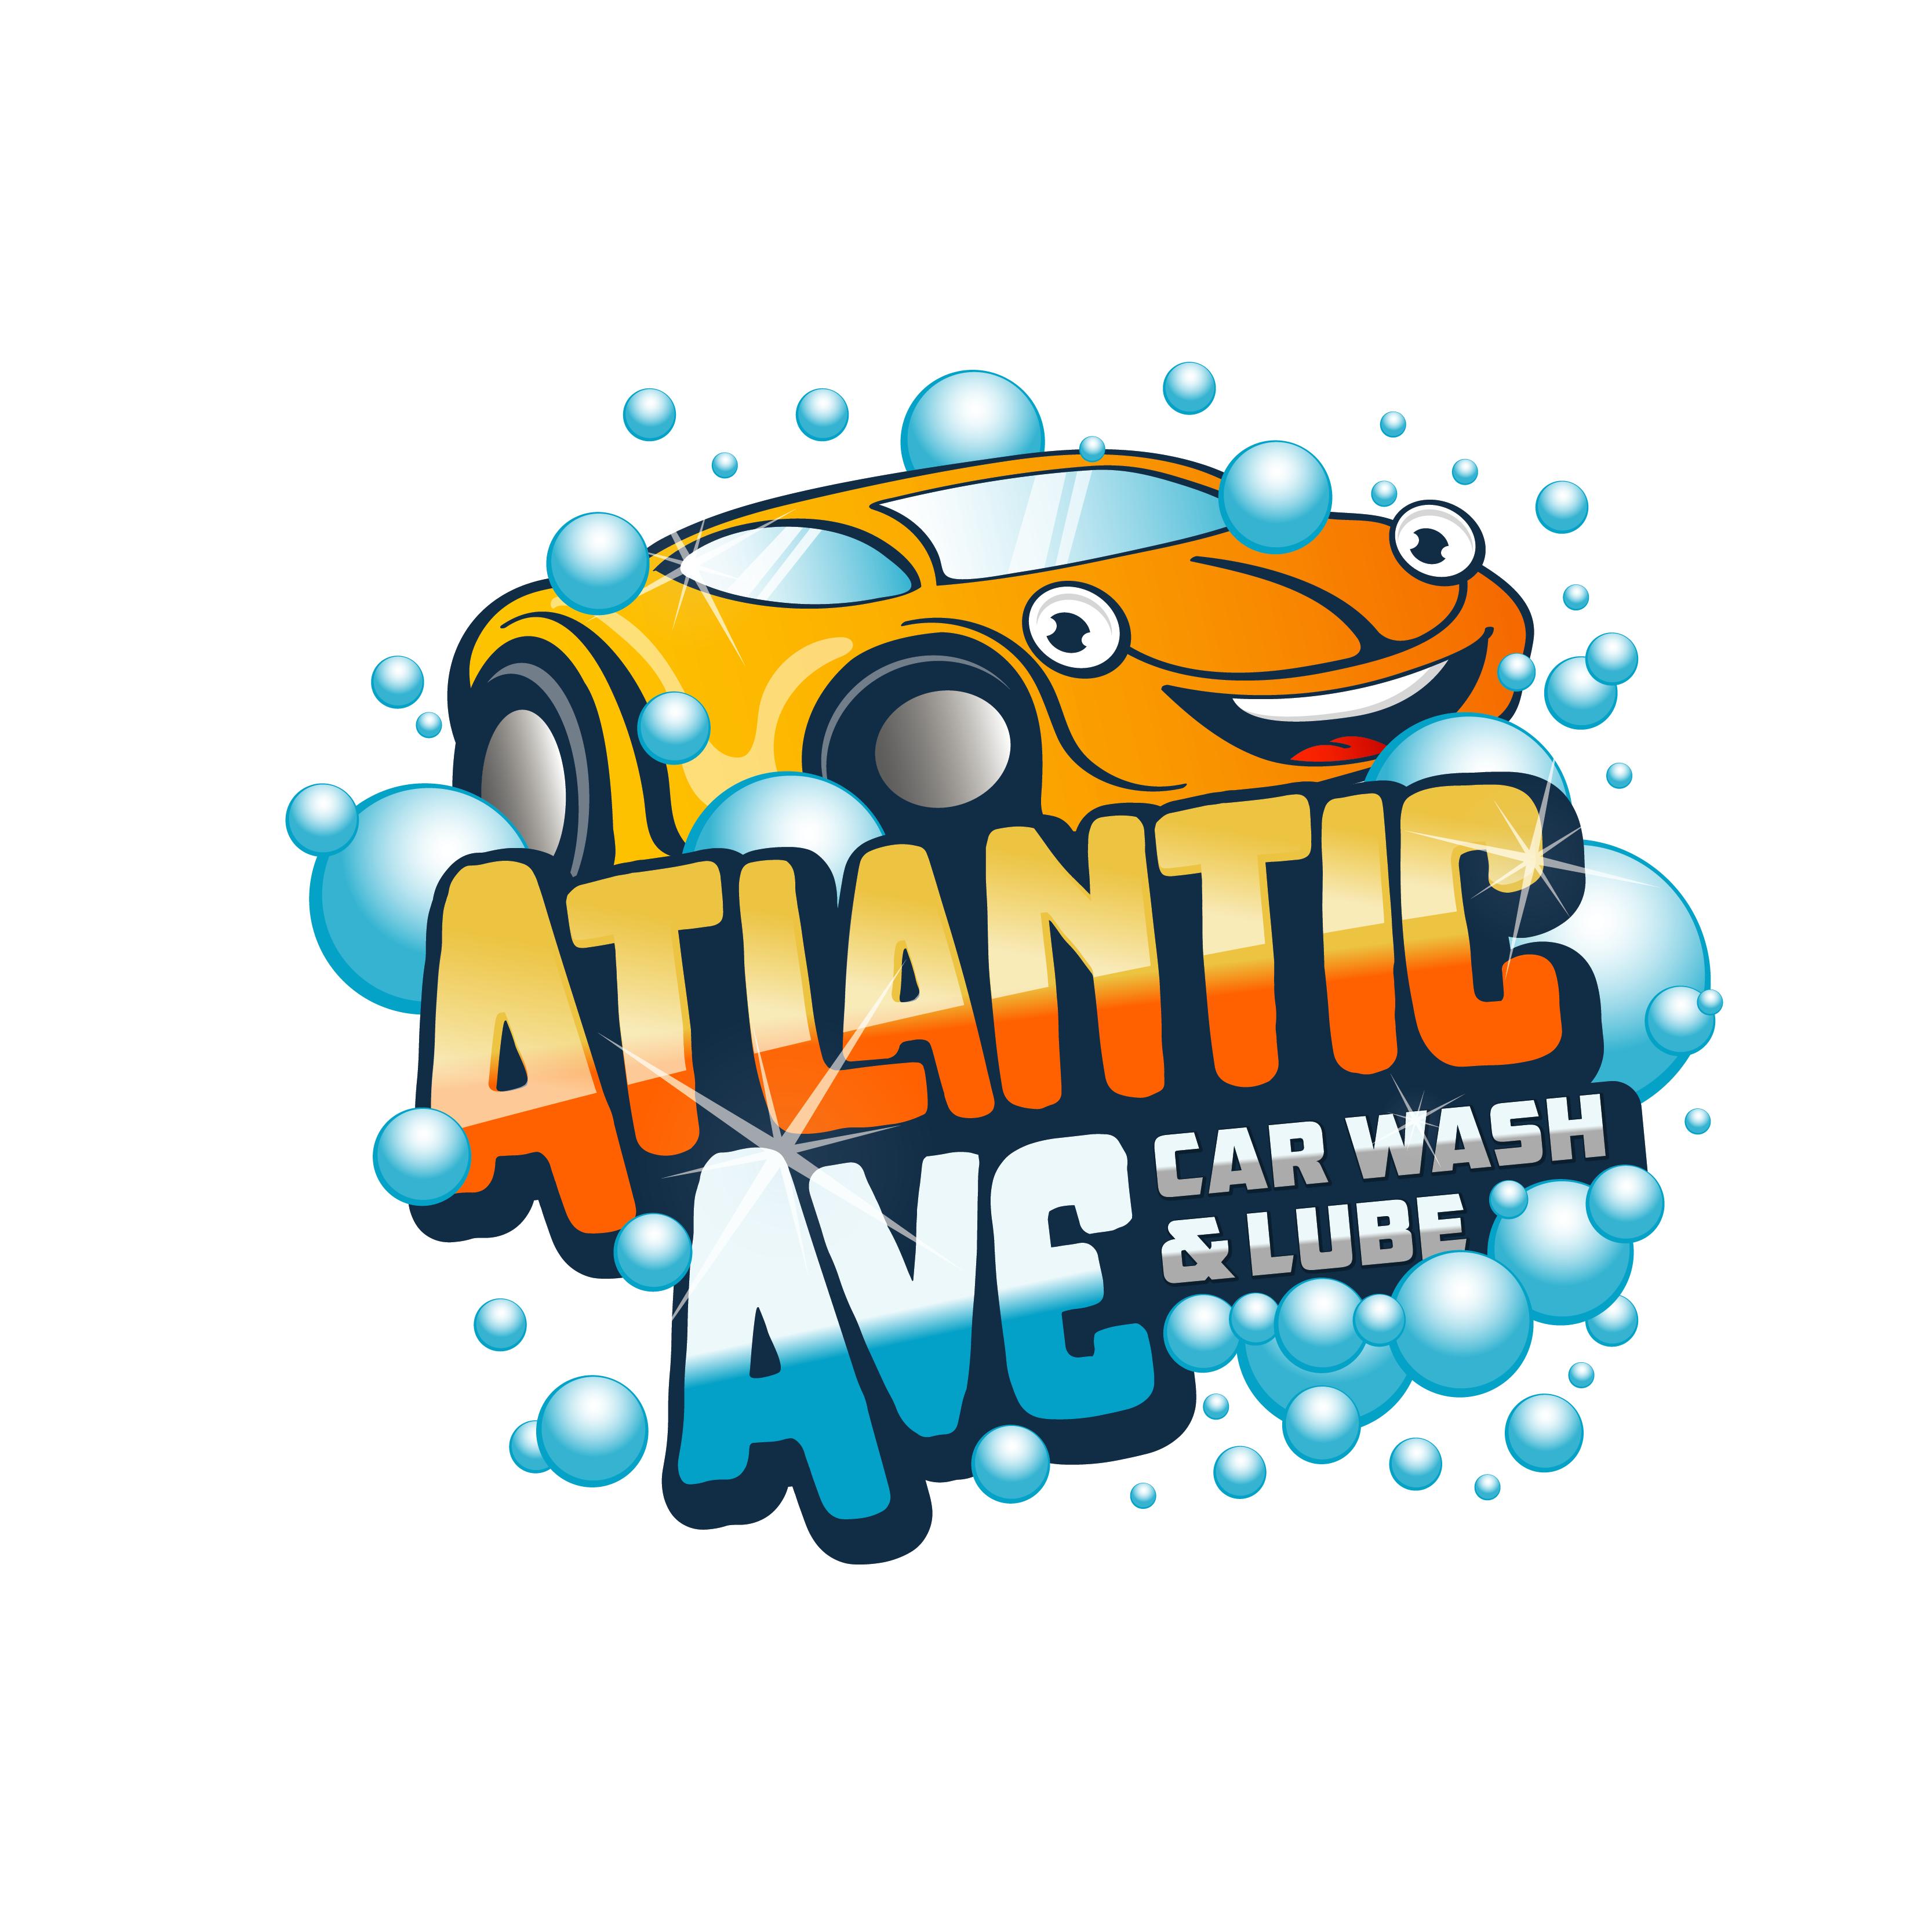 Atlantic Ave Car Wash & Lube